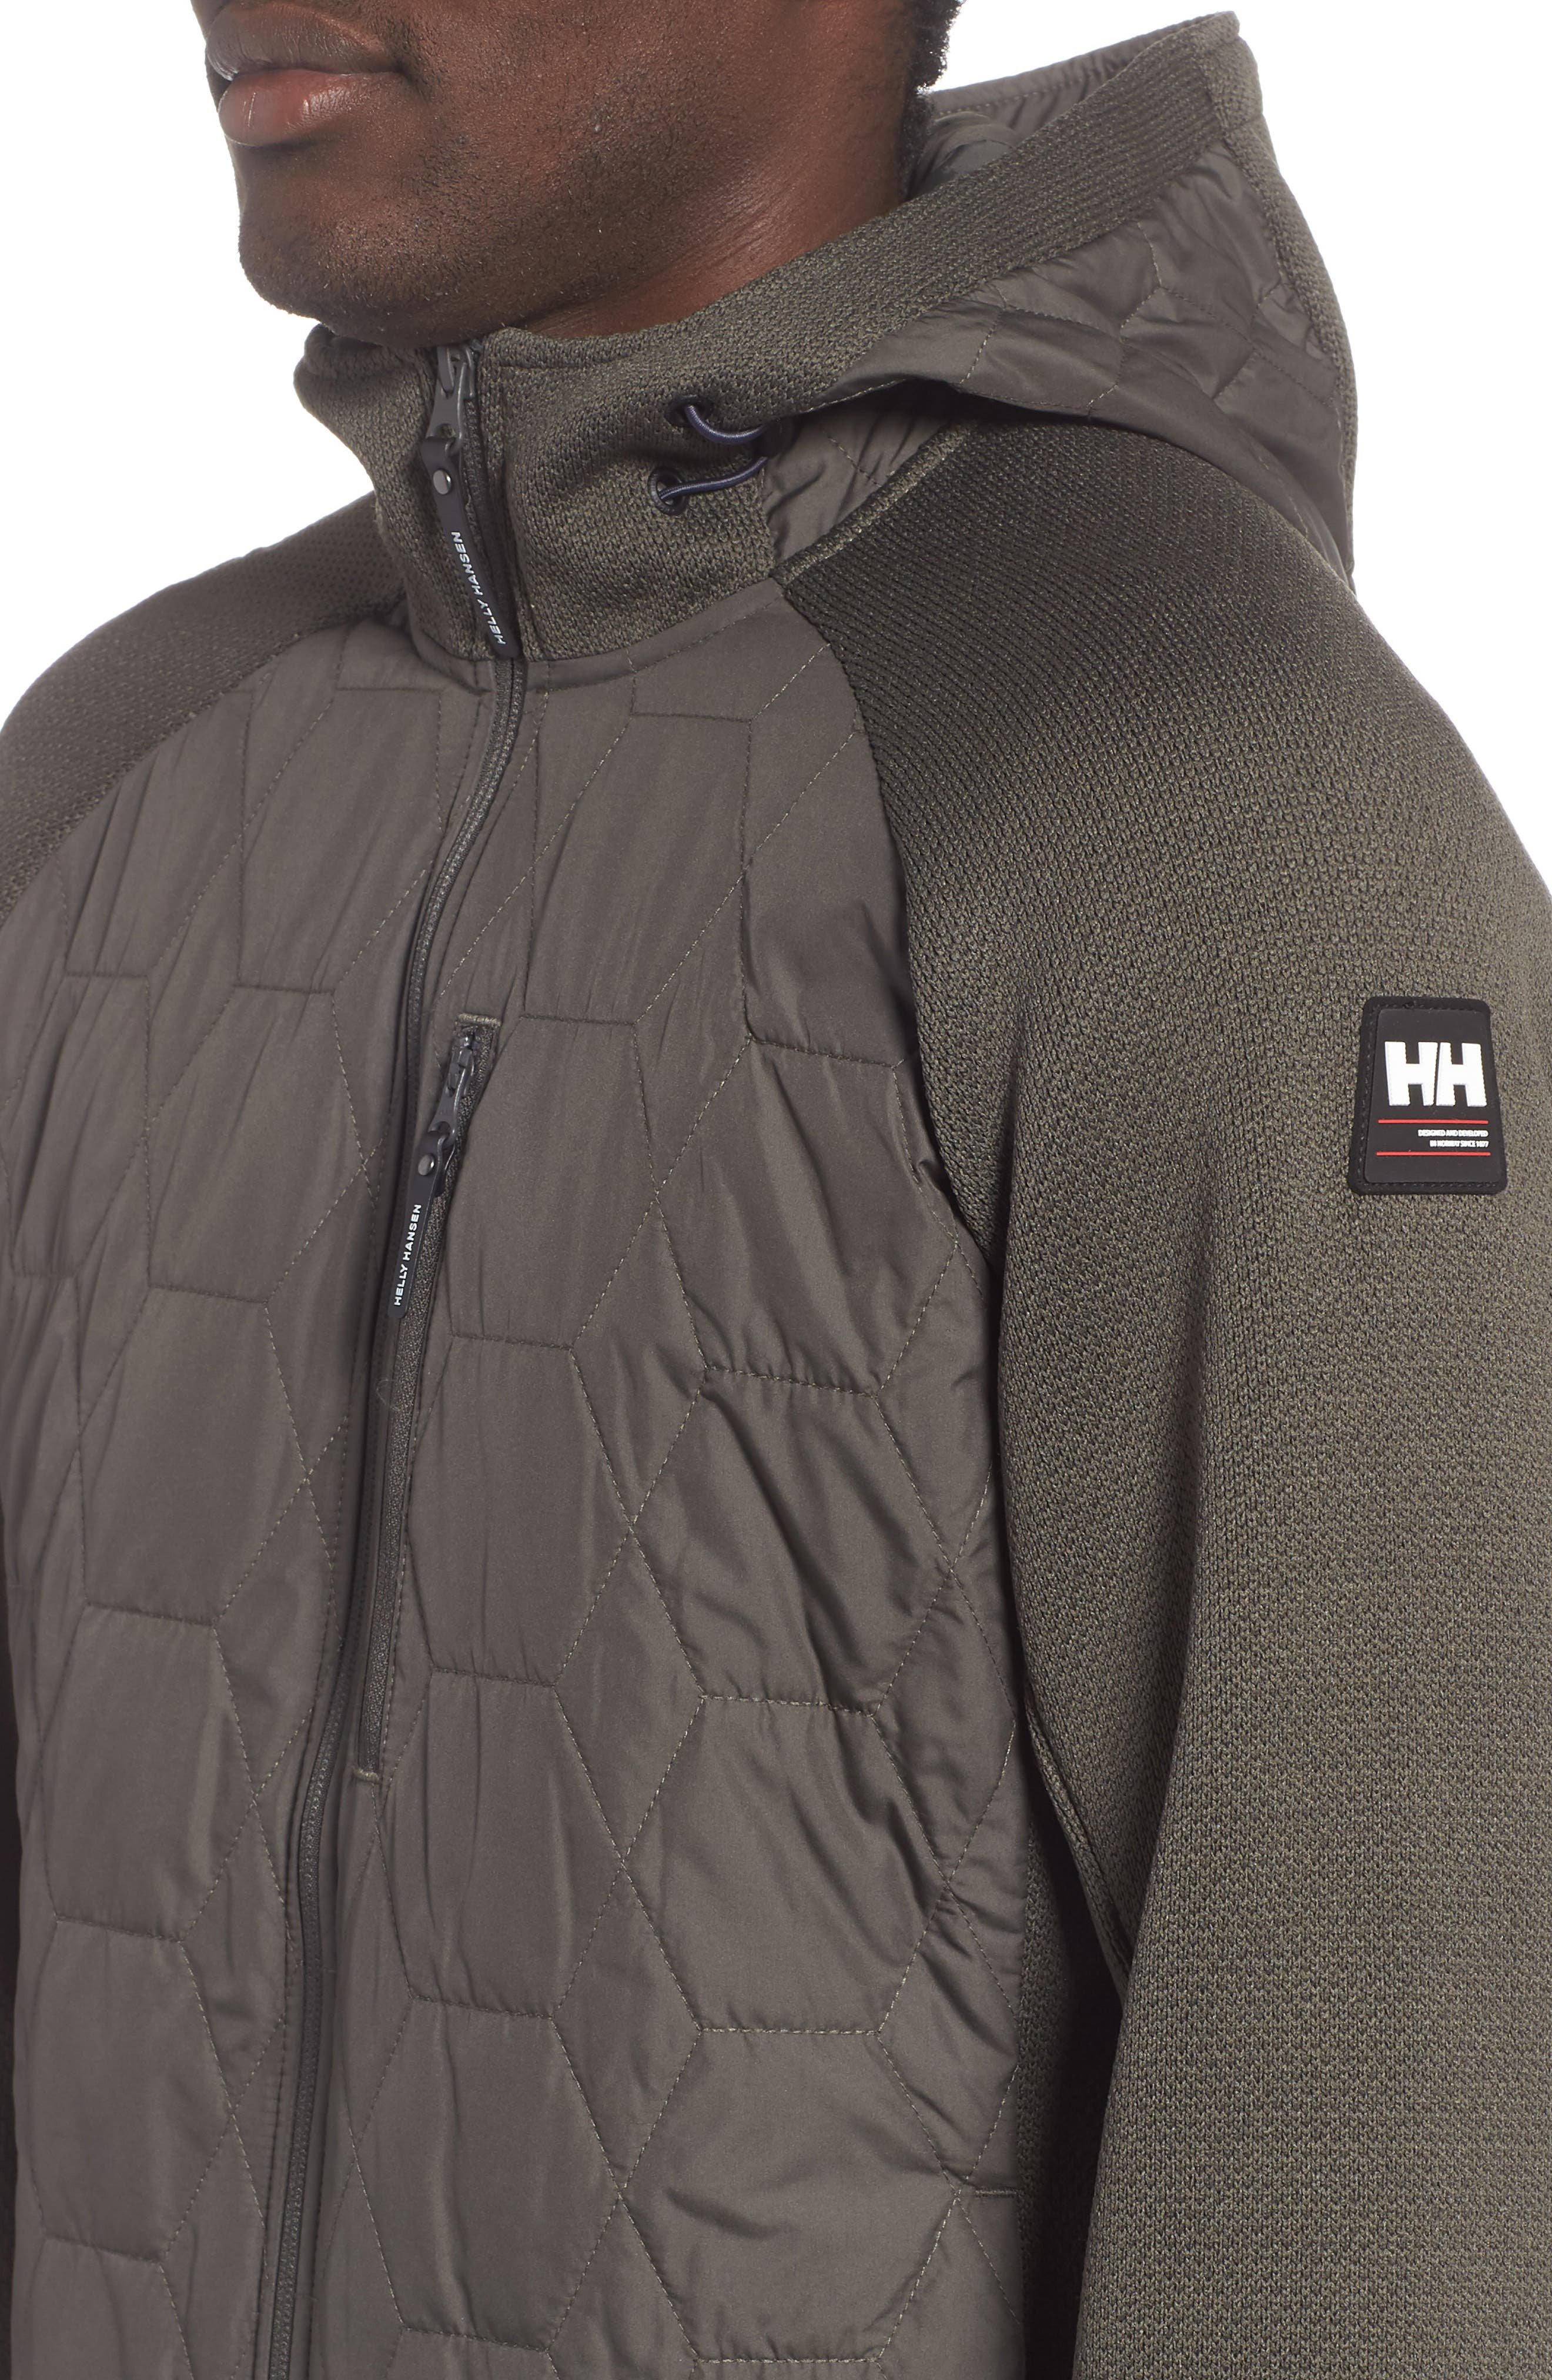 Shore Hybrid Insulator Jacket,                             Alternate thumbnail 4, color,                             BELUGA